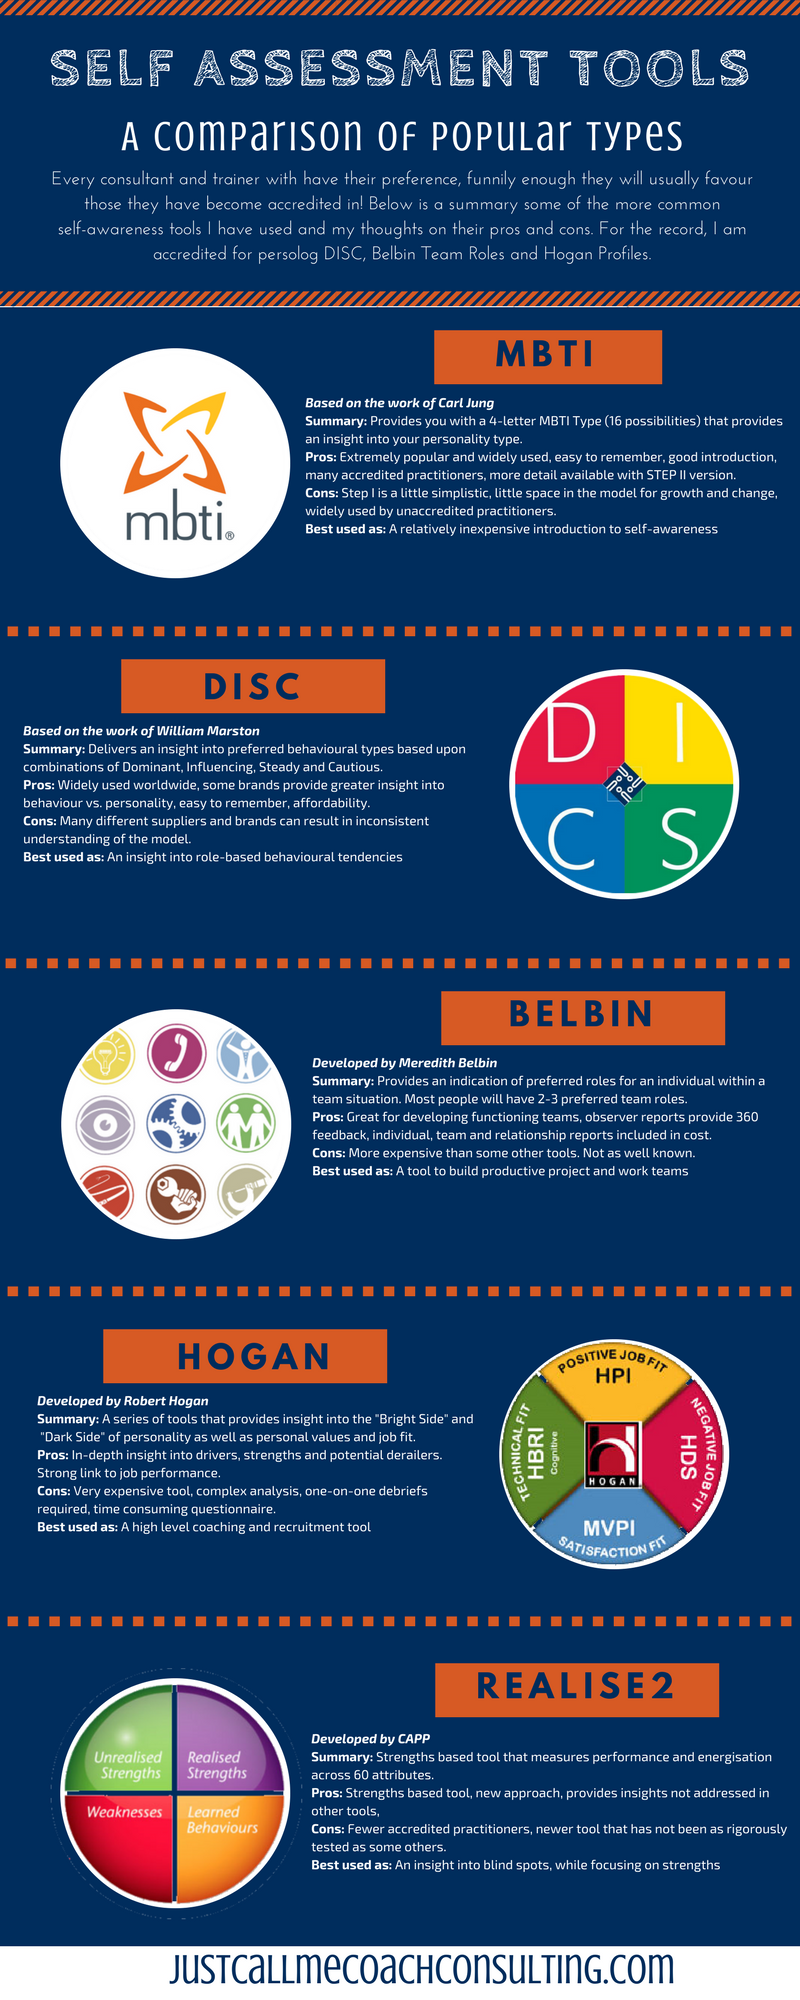 Self Assessment Tool Comparison | MBTI | DISC | Belbin | Hogan | Realise2